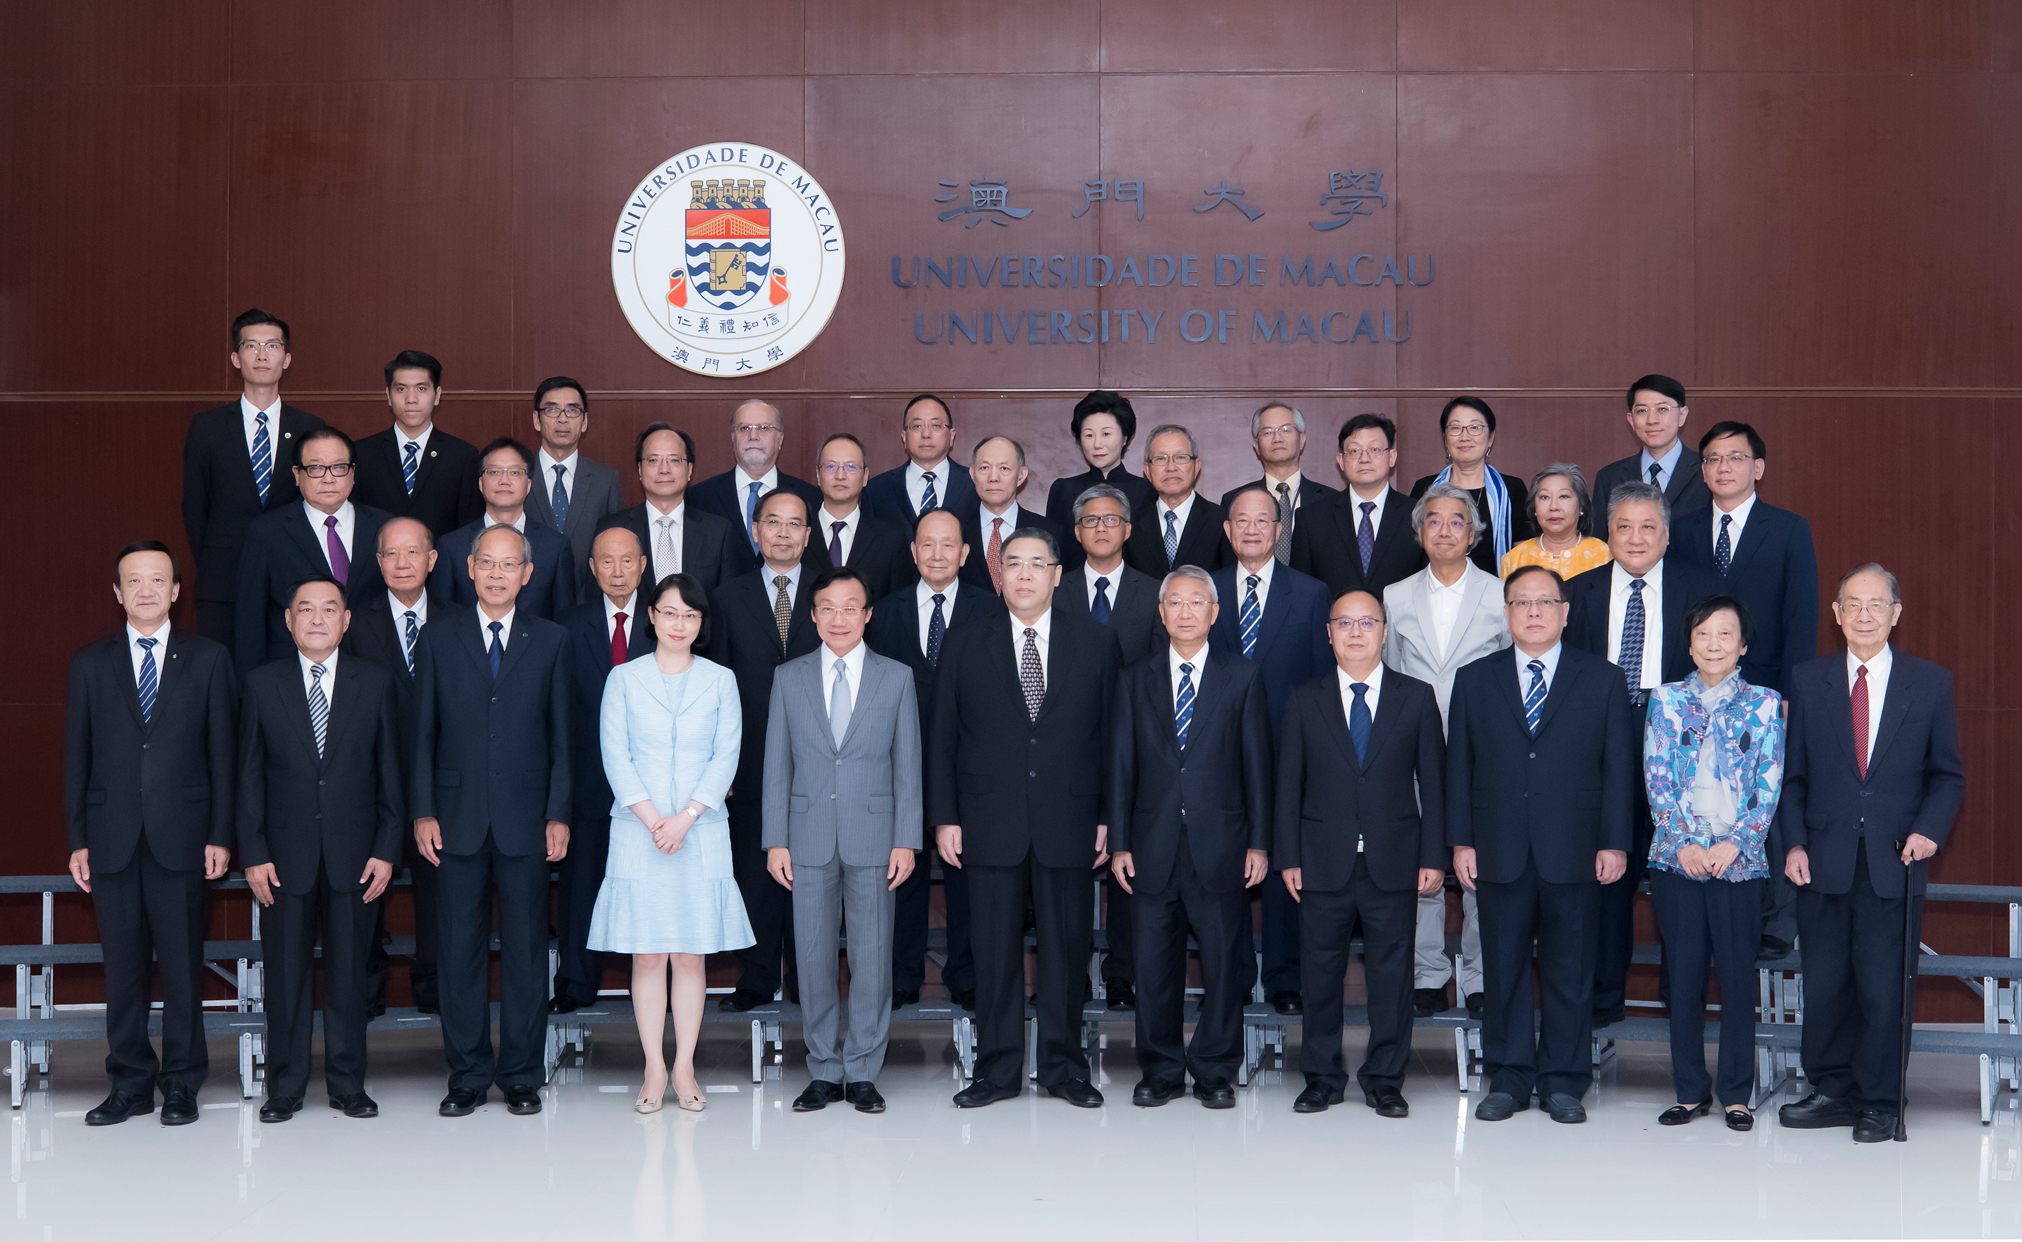 UM Chancellor Chui Sai On with UA and UC members